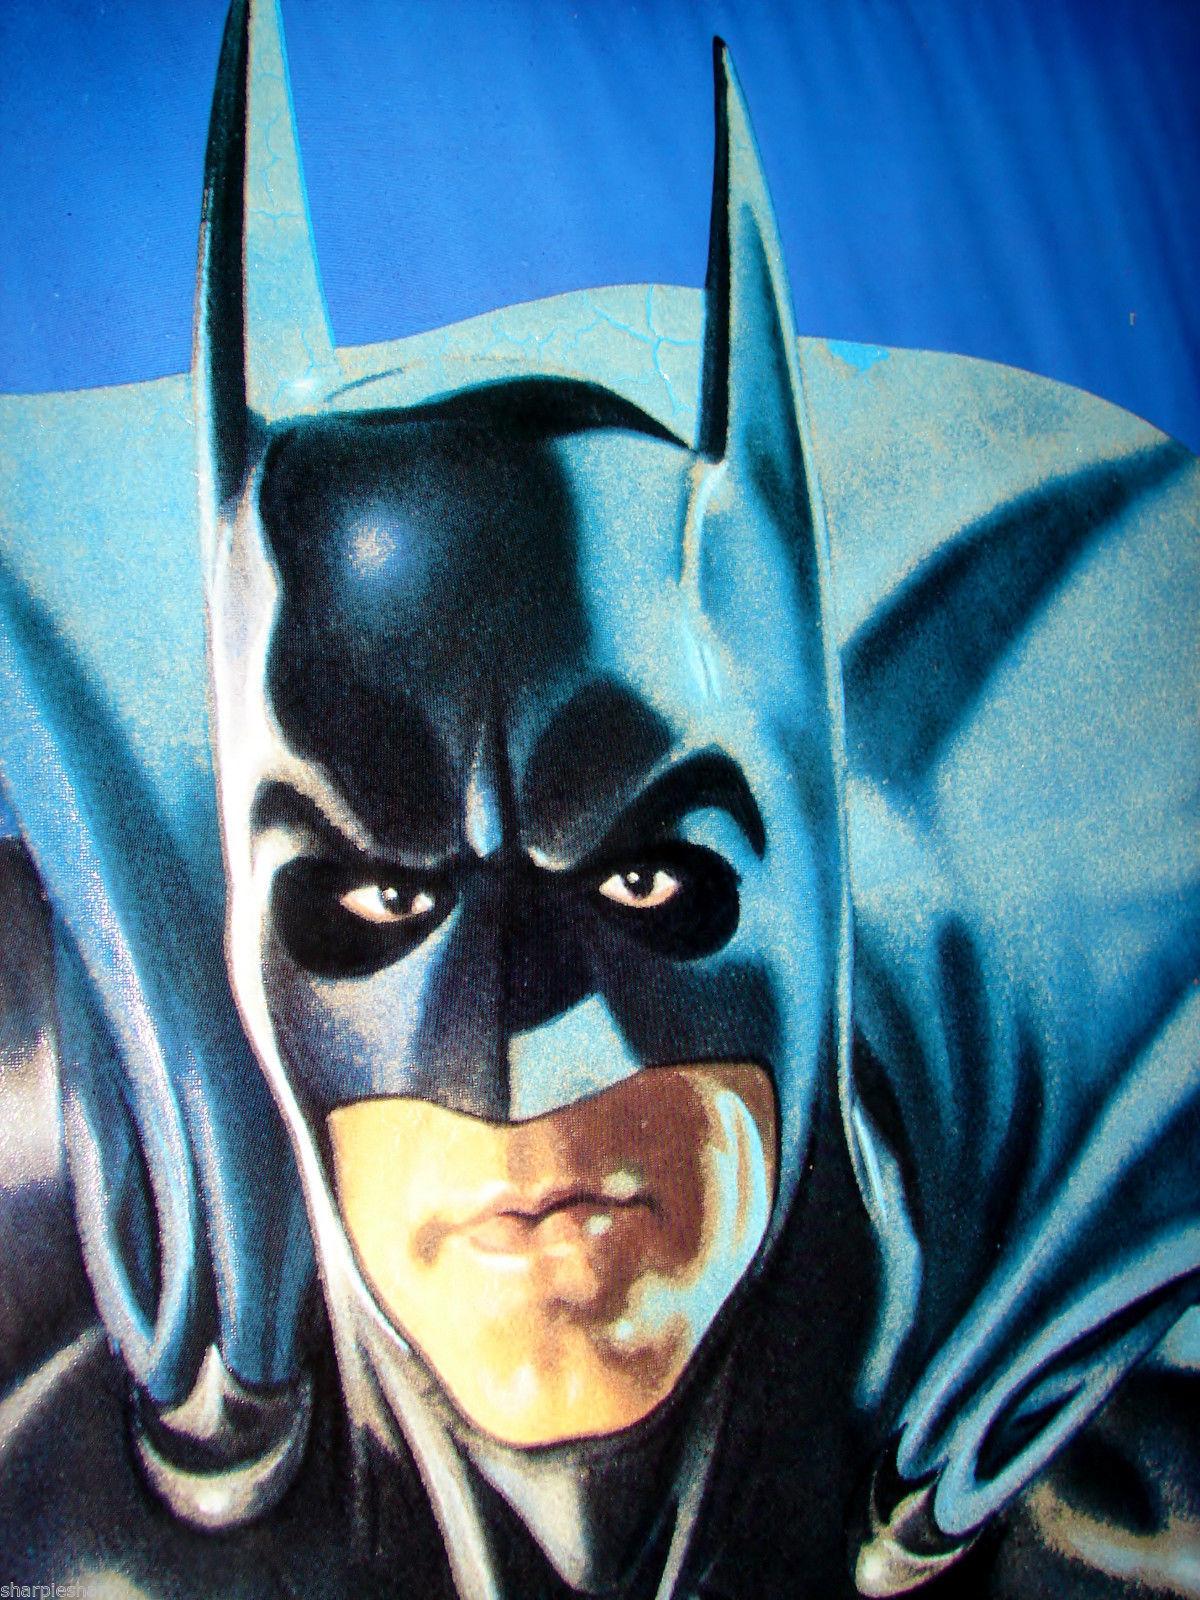 "1997 BATMAN & ROBIN Movie BATMAN GLOW IN THE DARK POSTER 23x34.5"" 30-005 2"